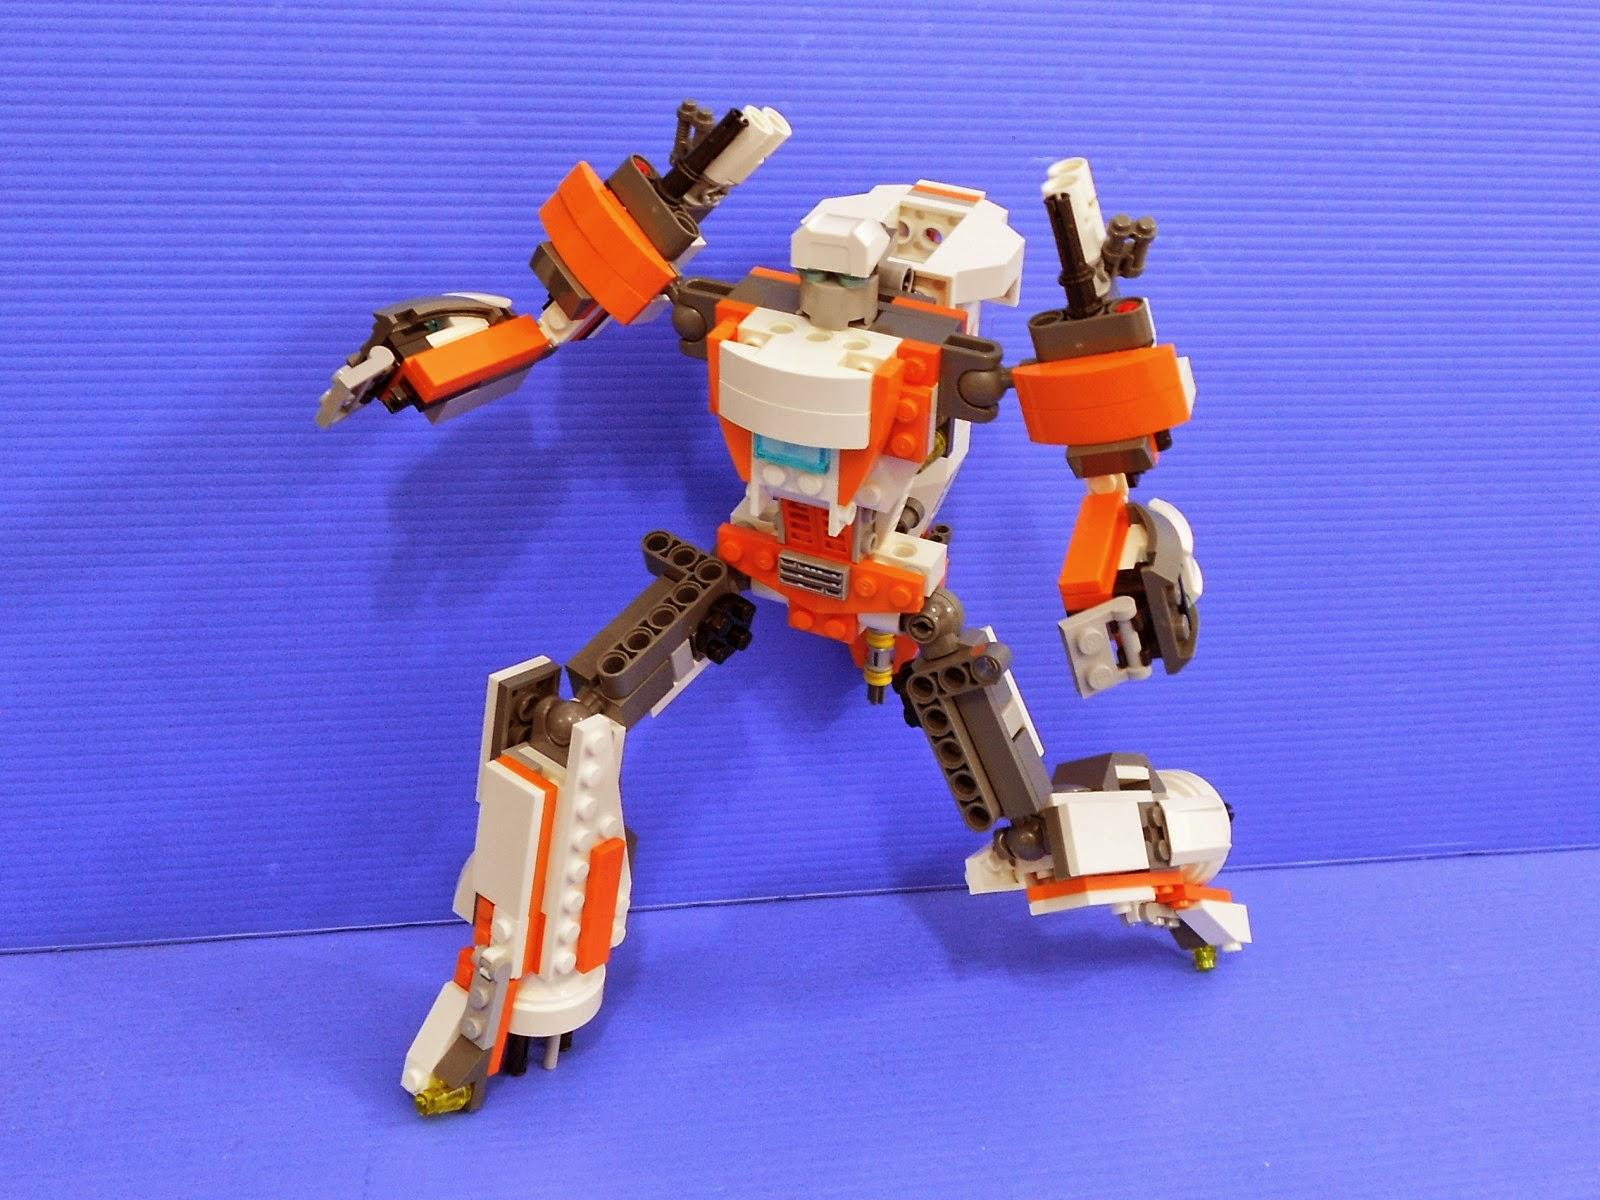 Alanyuppies Lego Transformers Lego 70707 Eradicator Mech Alternate